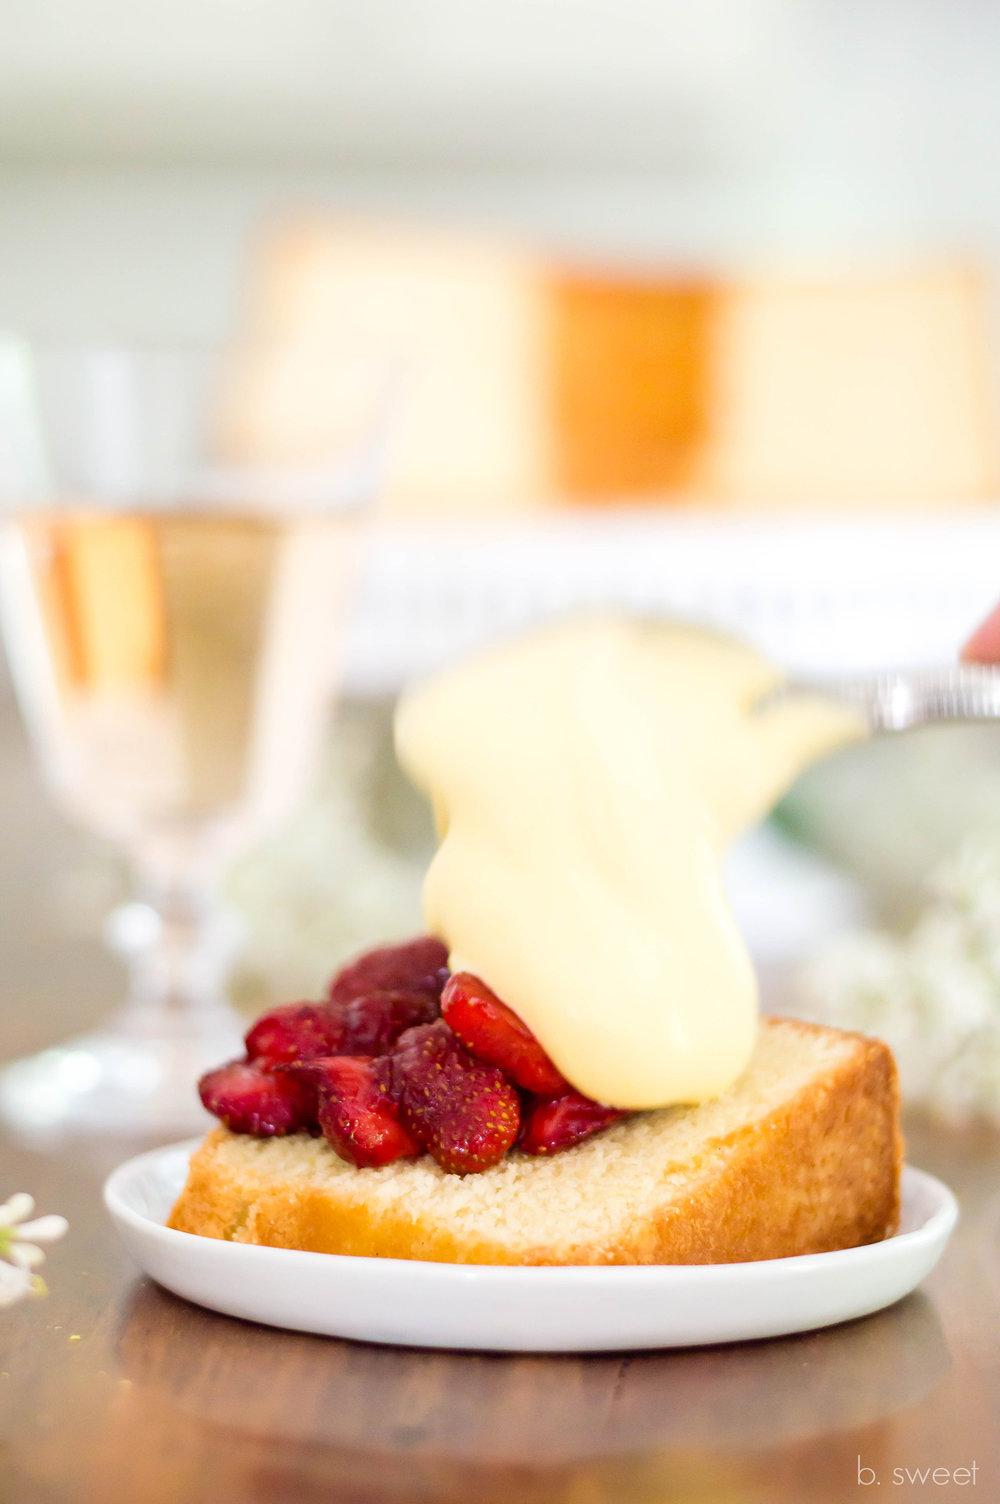 Lemon Pound Cake with Roasted Strawberries and Rosé Sabayon - b. sweet